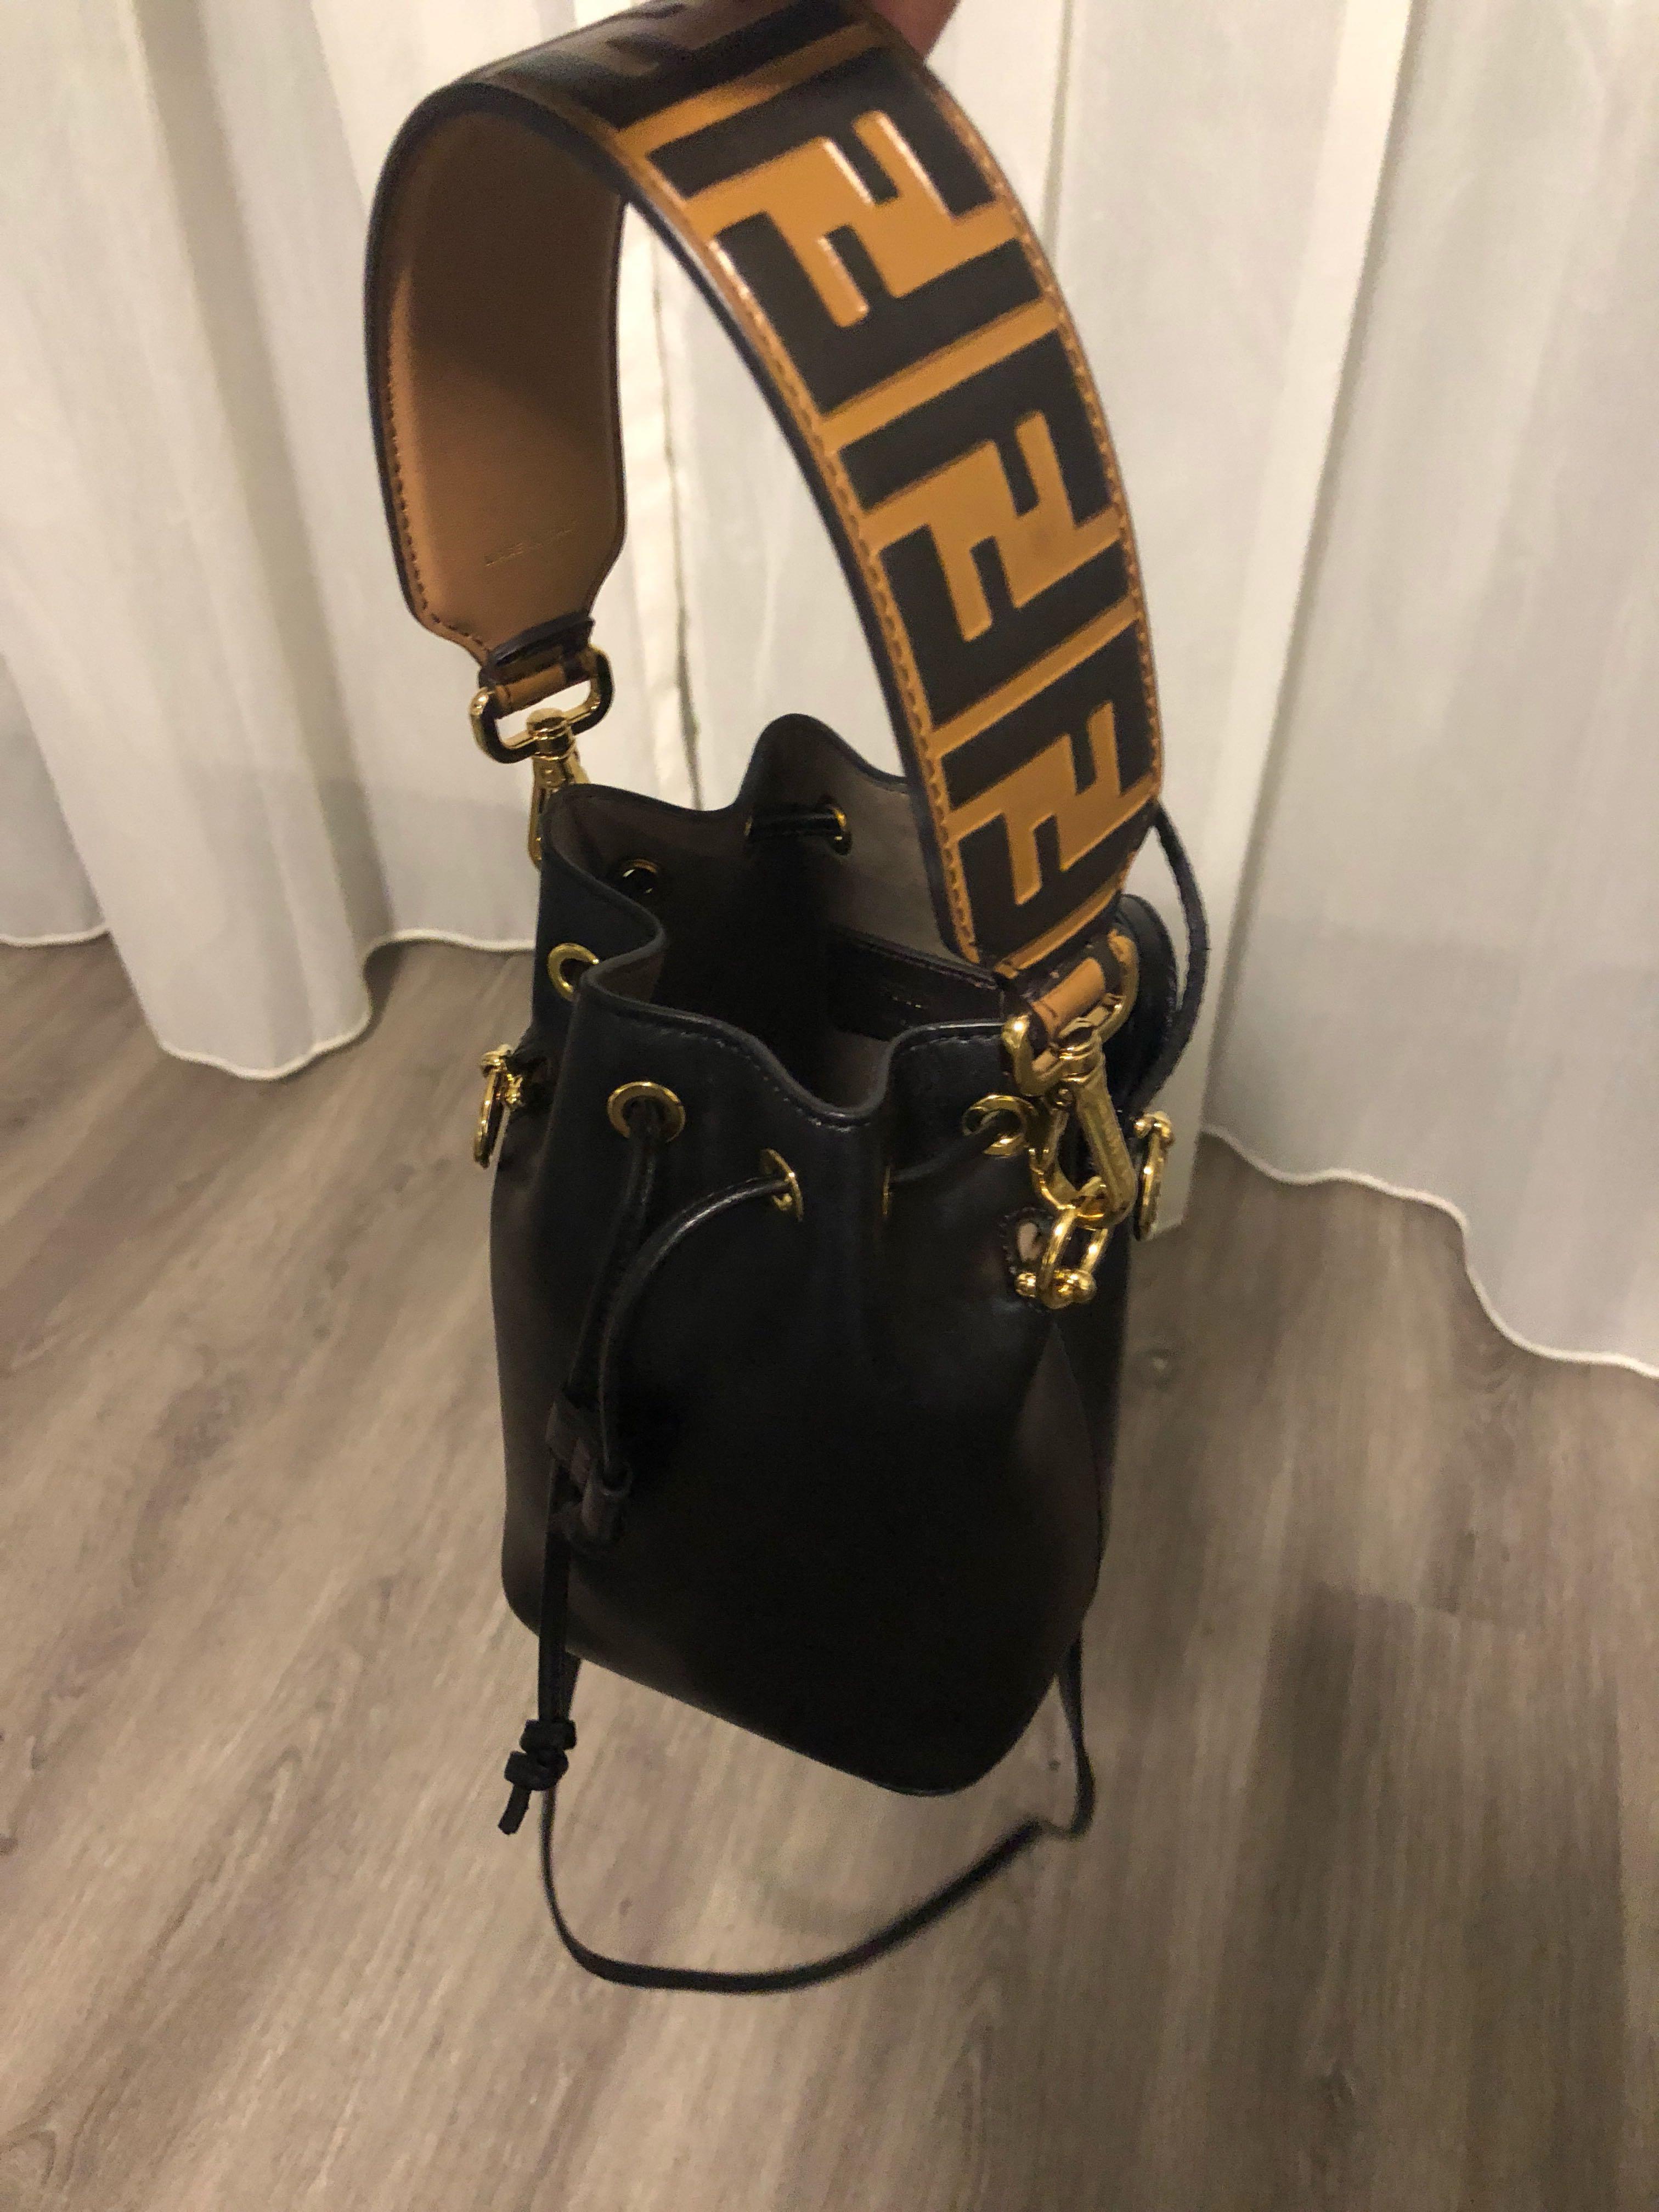 2c154ff59bf Fendi Mon Tresor Black (Selling Pairing with extra short Monogram Strap,  Women s Fashion, Bags   Wallets, Handbags on Carousell